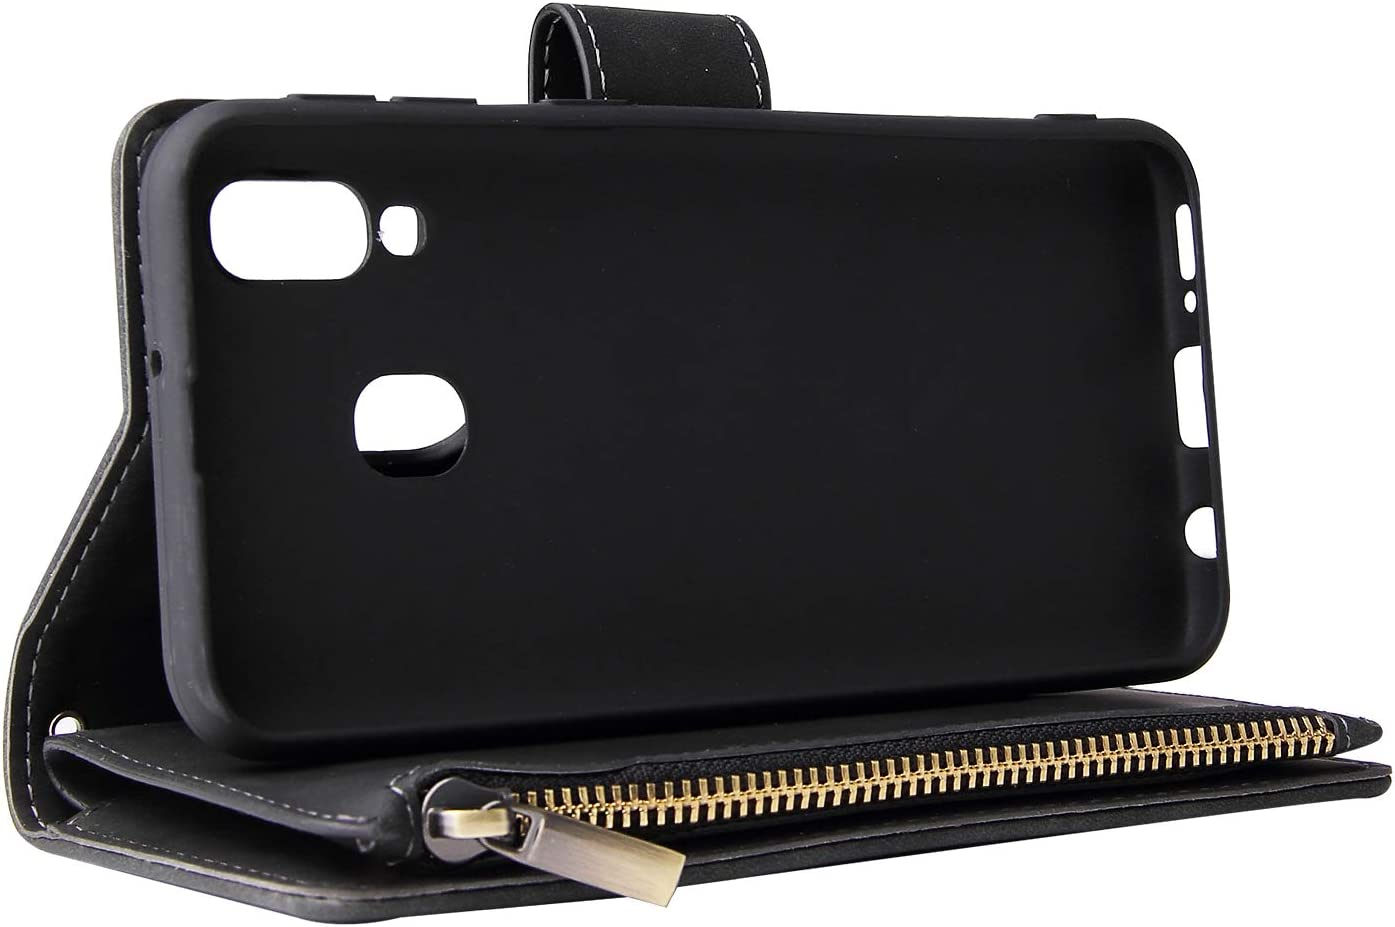 HUDDU Kompatibel mit Samsung Galaxy A40 H/ülle Leder Wallet Schutzh/ülle 6 Kartenf/ächer Handyh/ülle Silikon Rei/ßverschluss Brieftasche Filp Tasche PU Case St/änder Lederh/ülle Matte Band Wristlet Rotwein